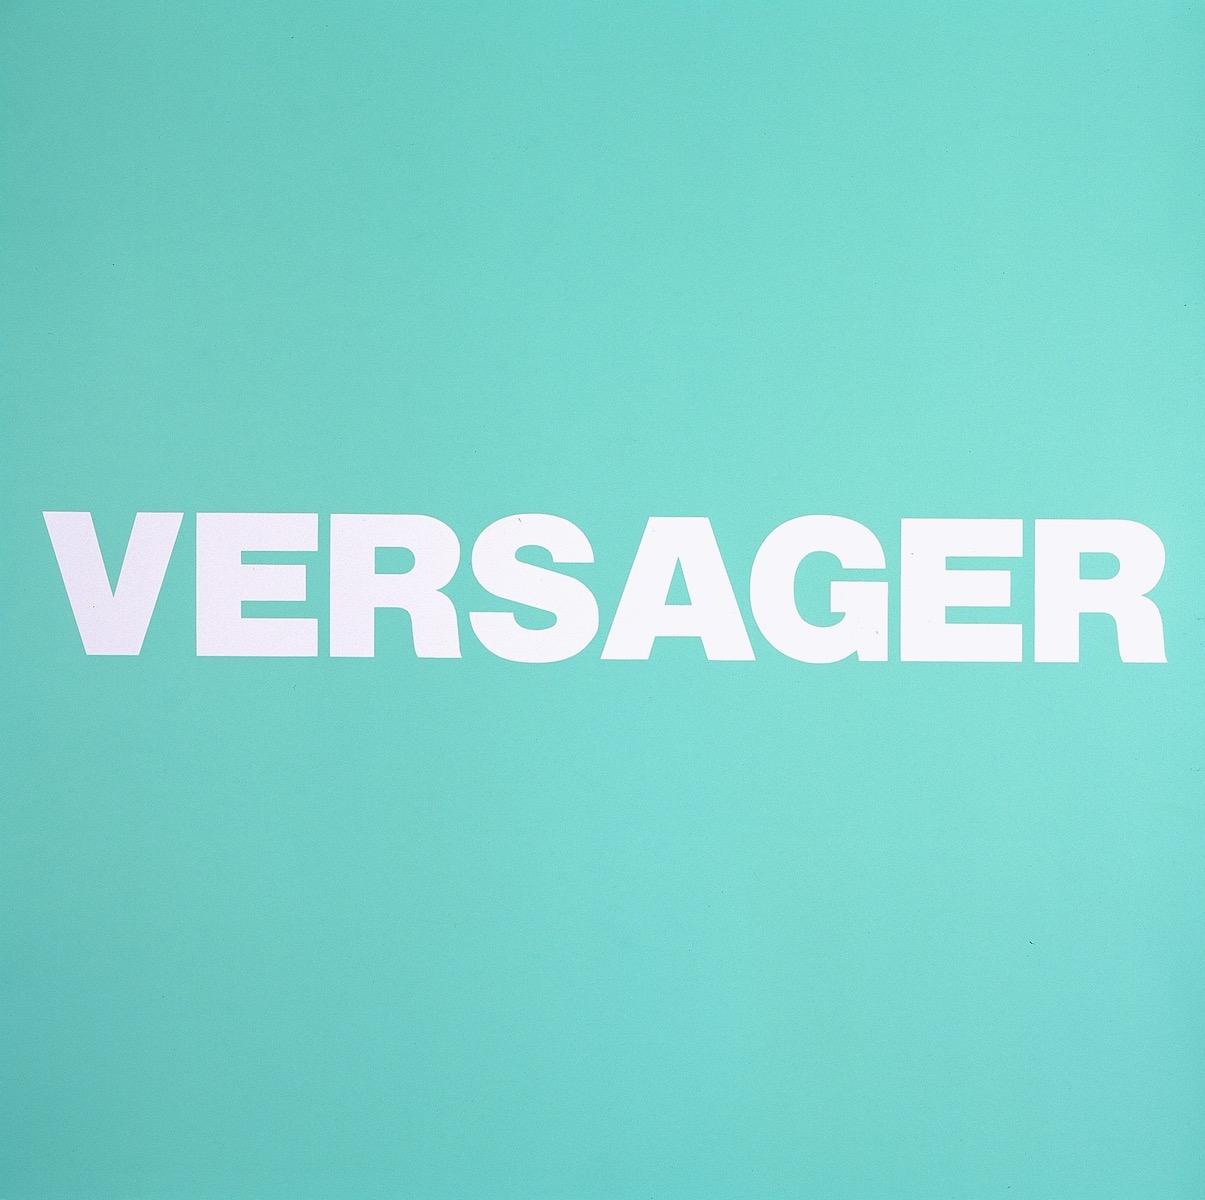 VERSAGER, GRÜN | Affirmation tut gut | Angelika Beuler | 1992